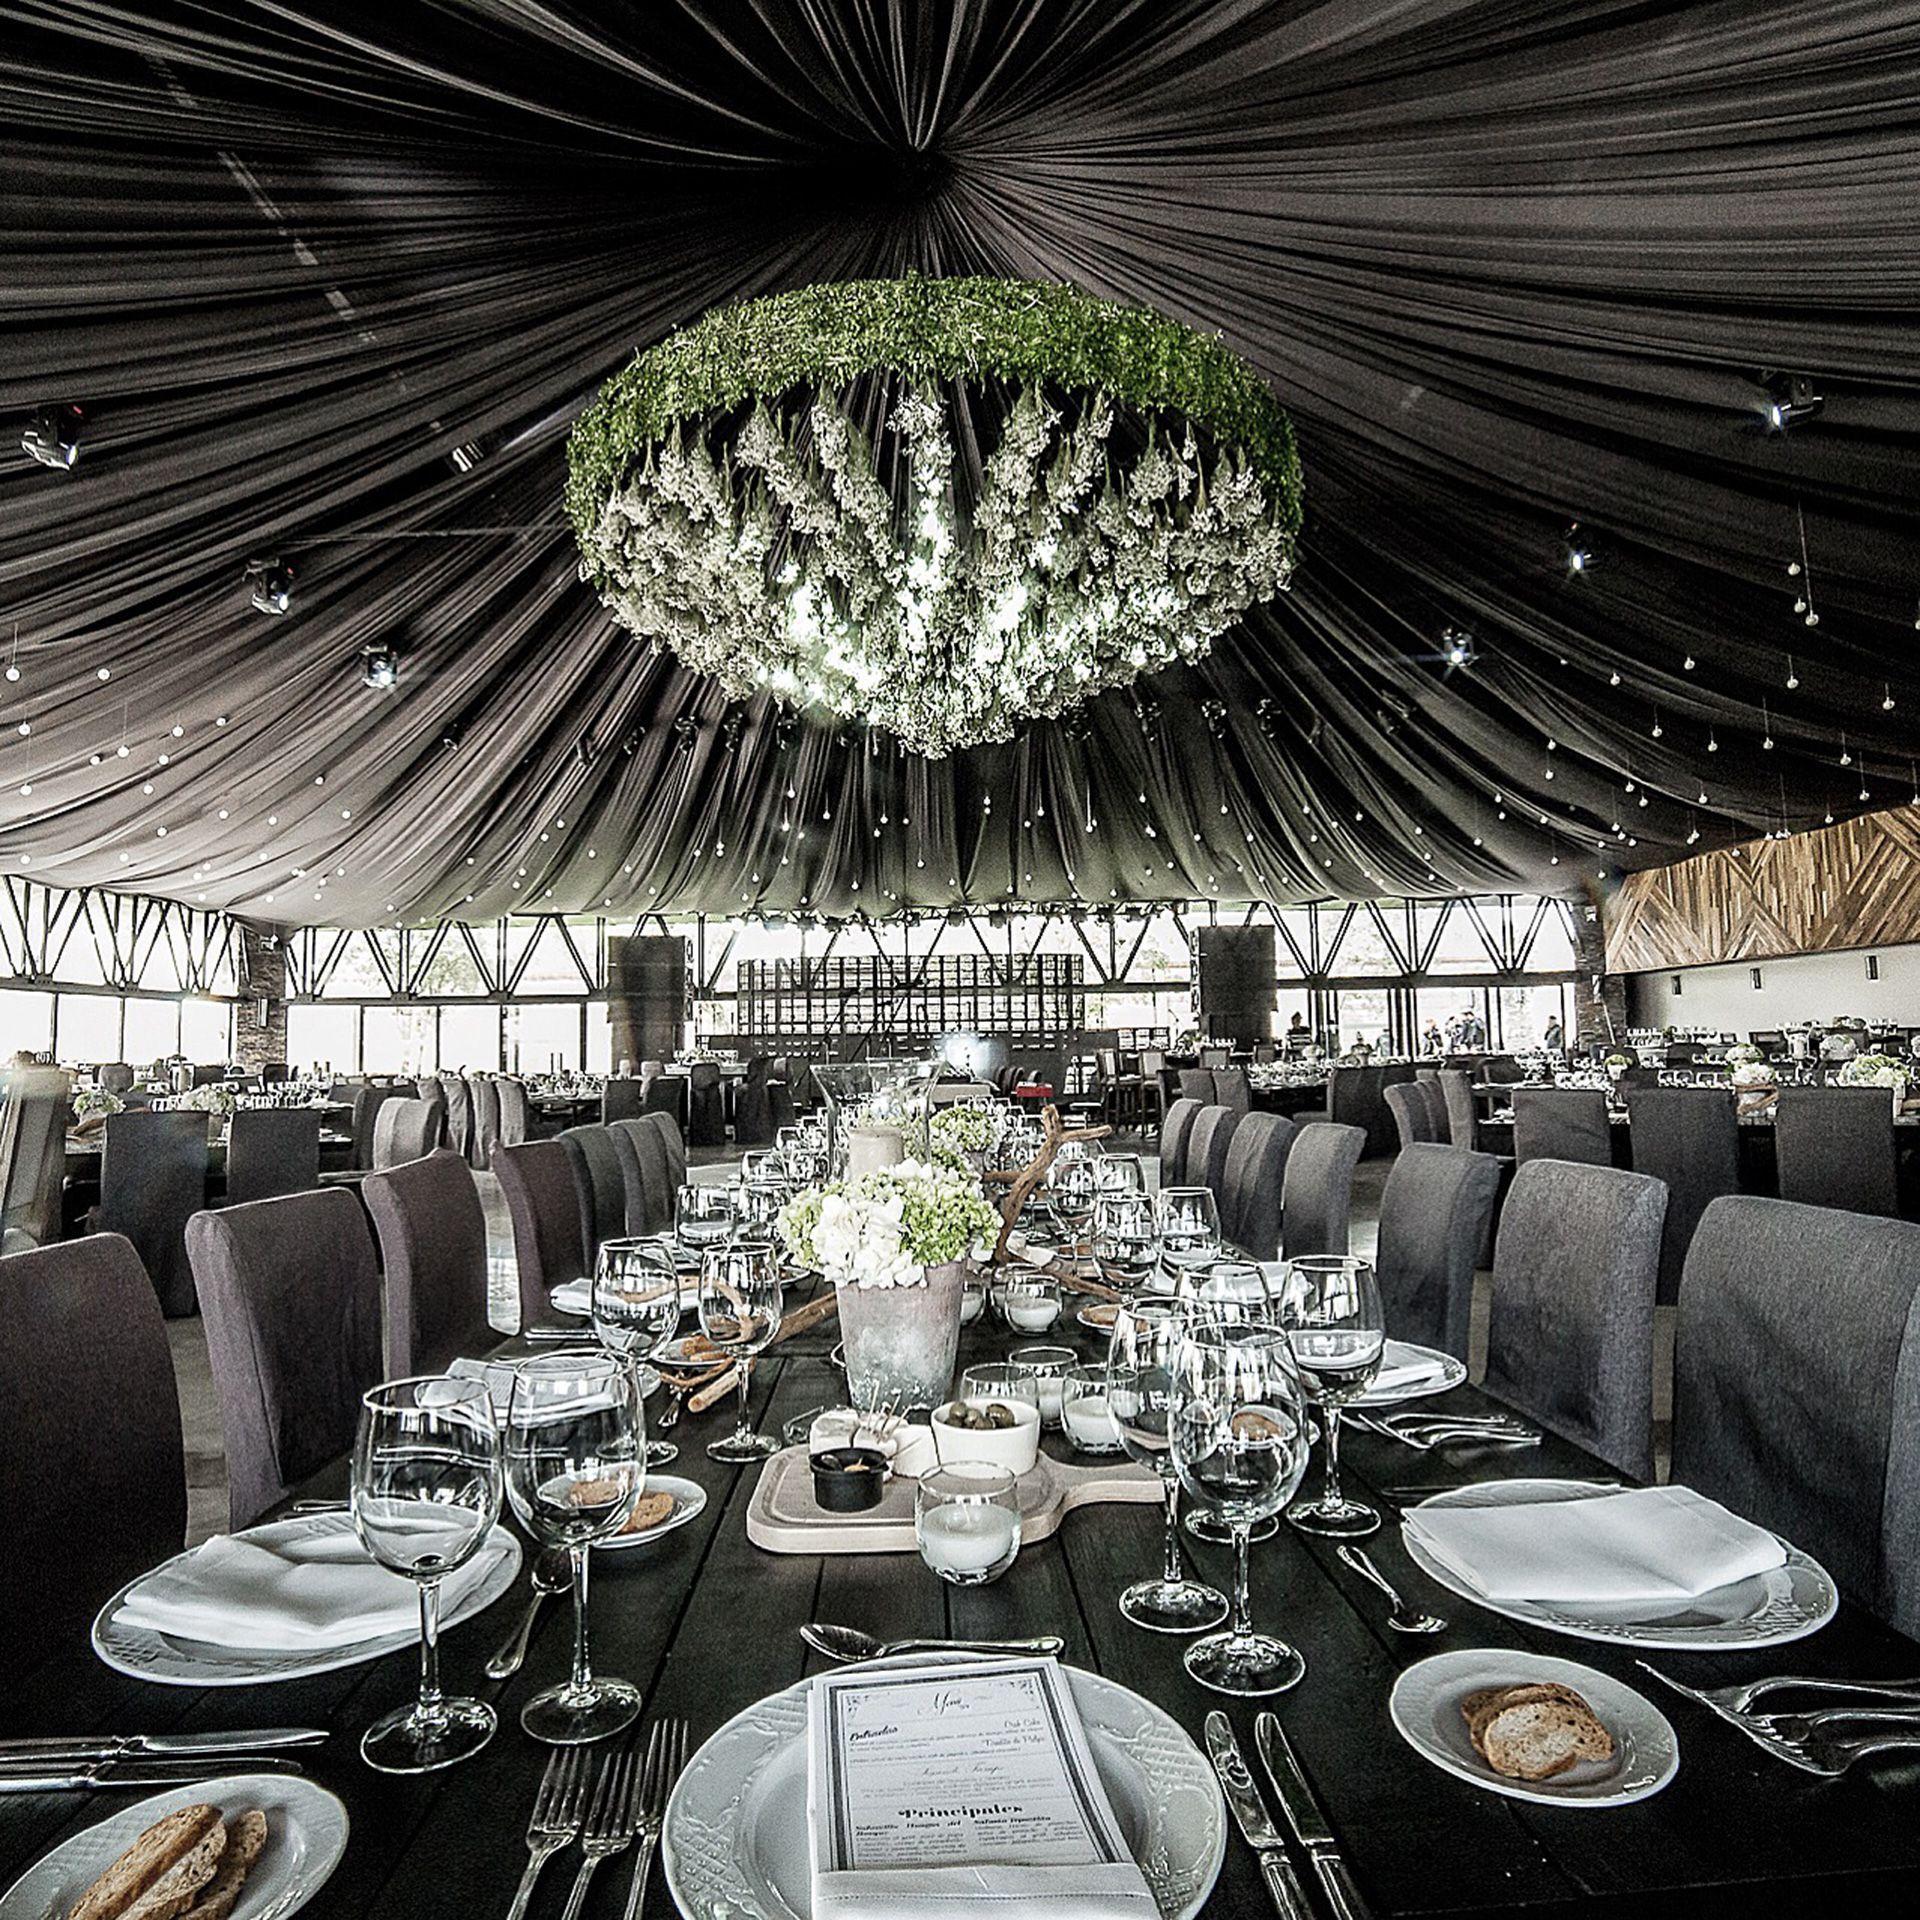 Wedding stage decor ideas  Peter de Anda u Wedding Planner techosverdes  green roofs